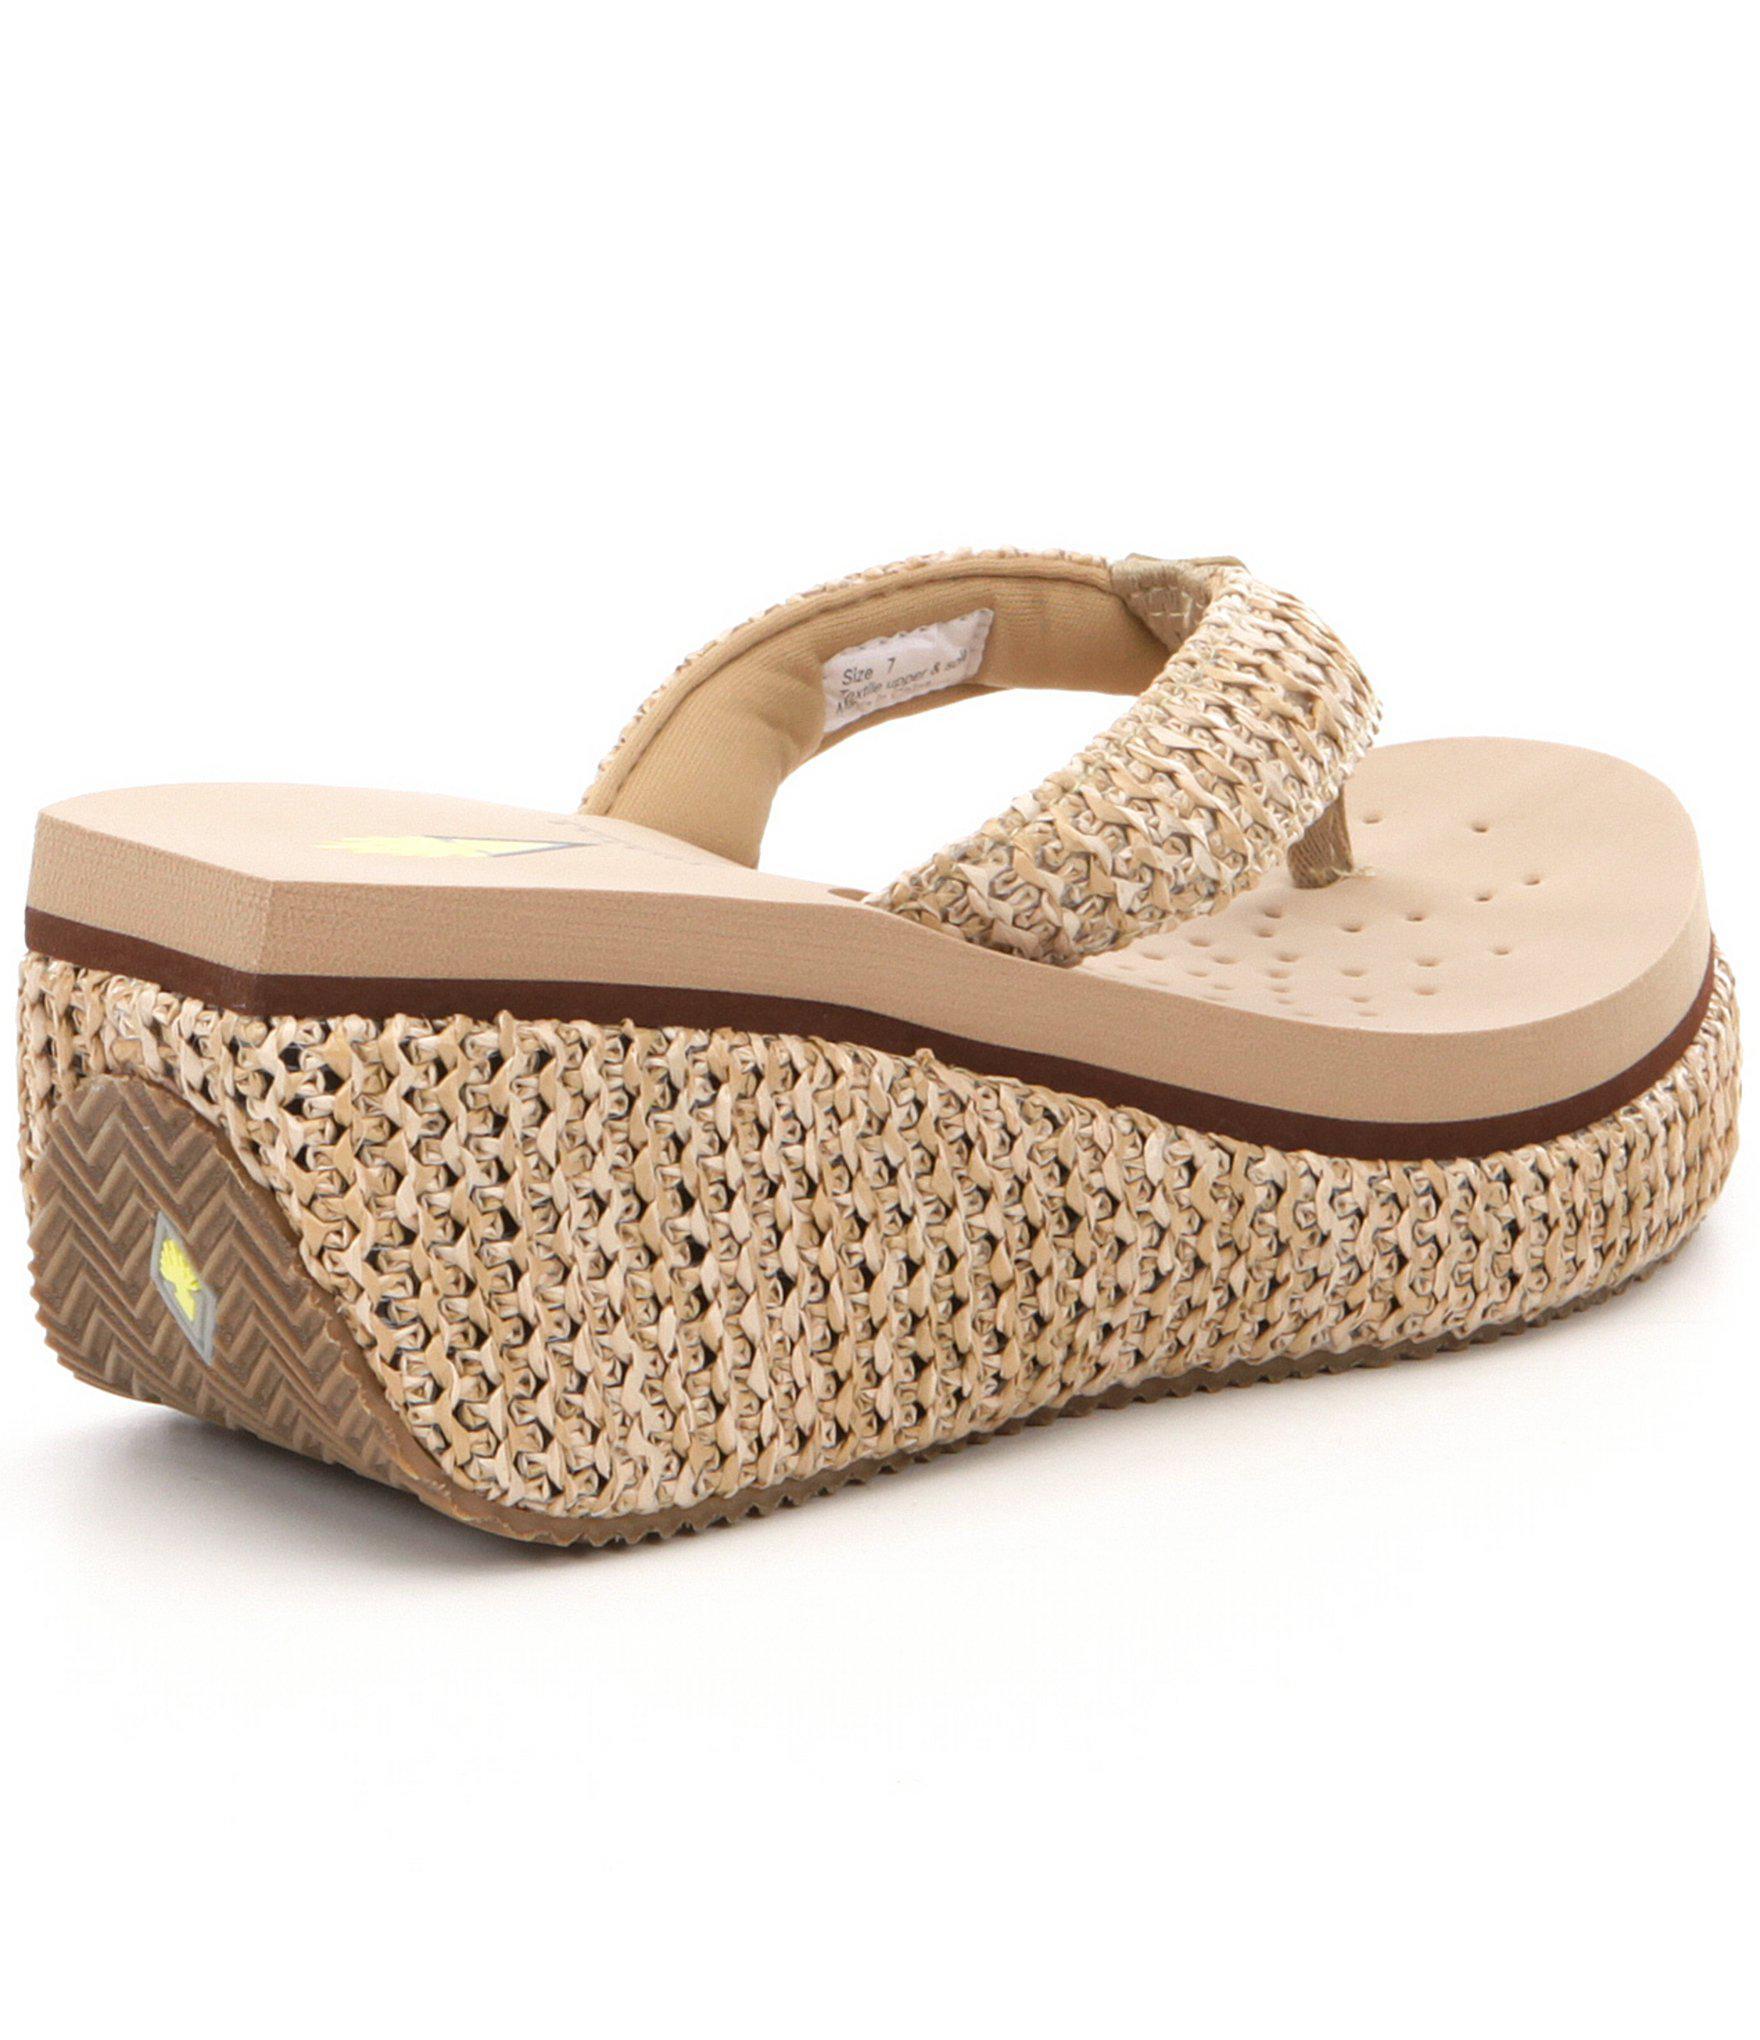 f65d07d231 Volatile - Natural Zadie Raffia Platform Wedge Sandals - Lyst. View  fullscreen